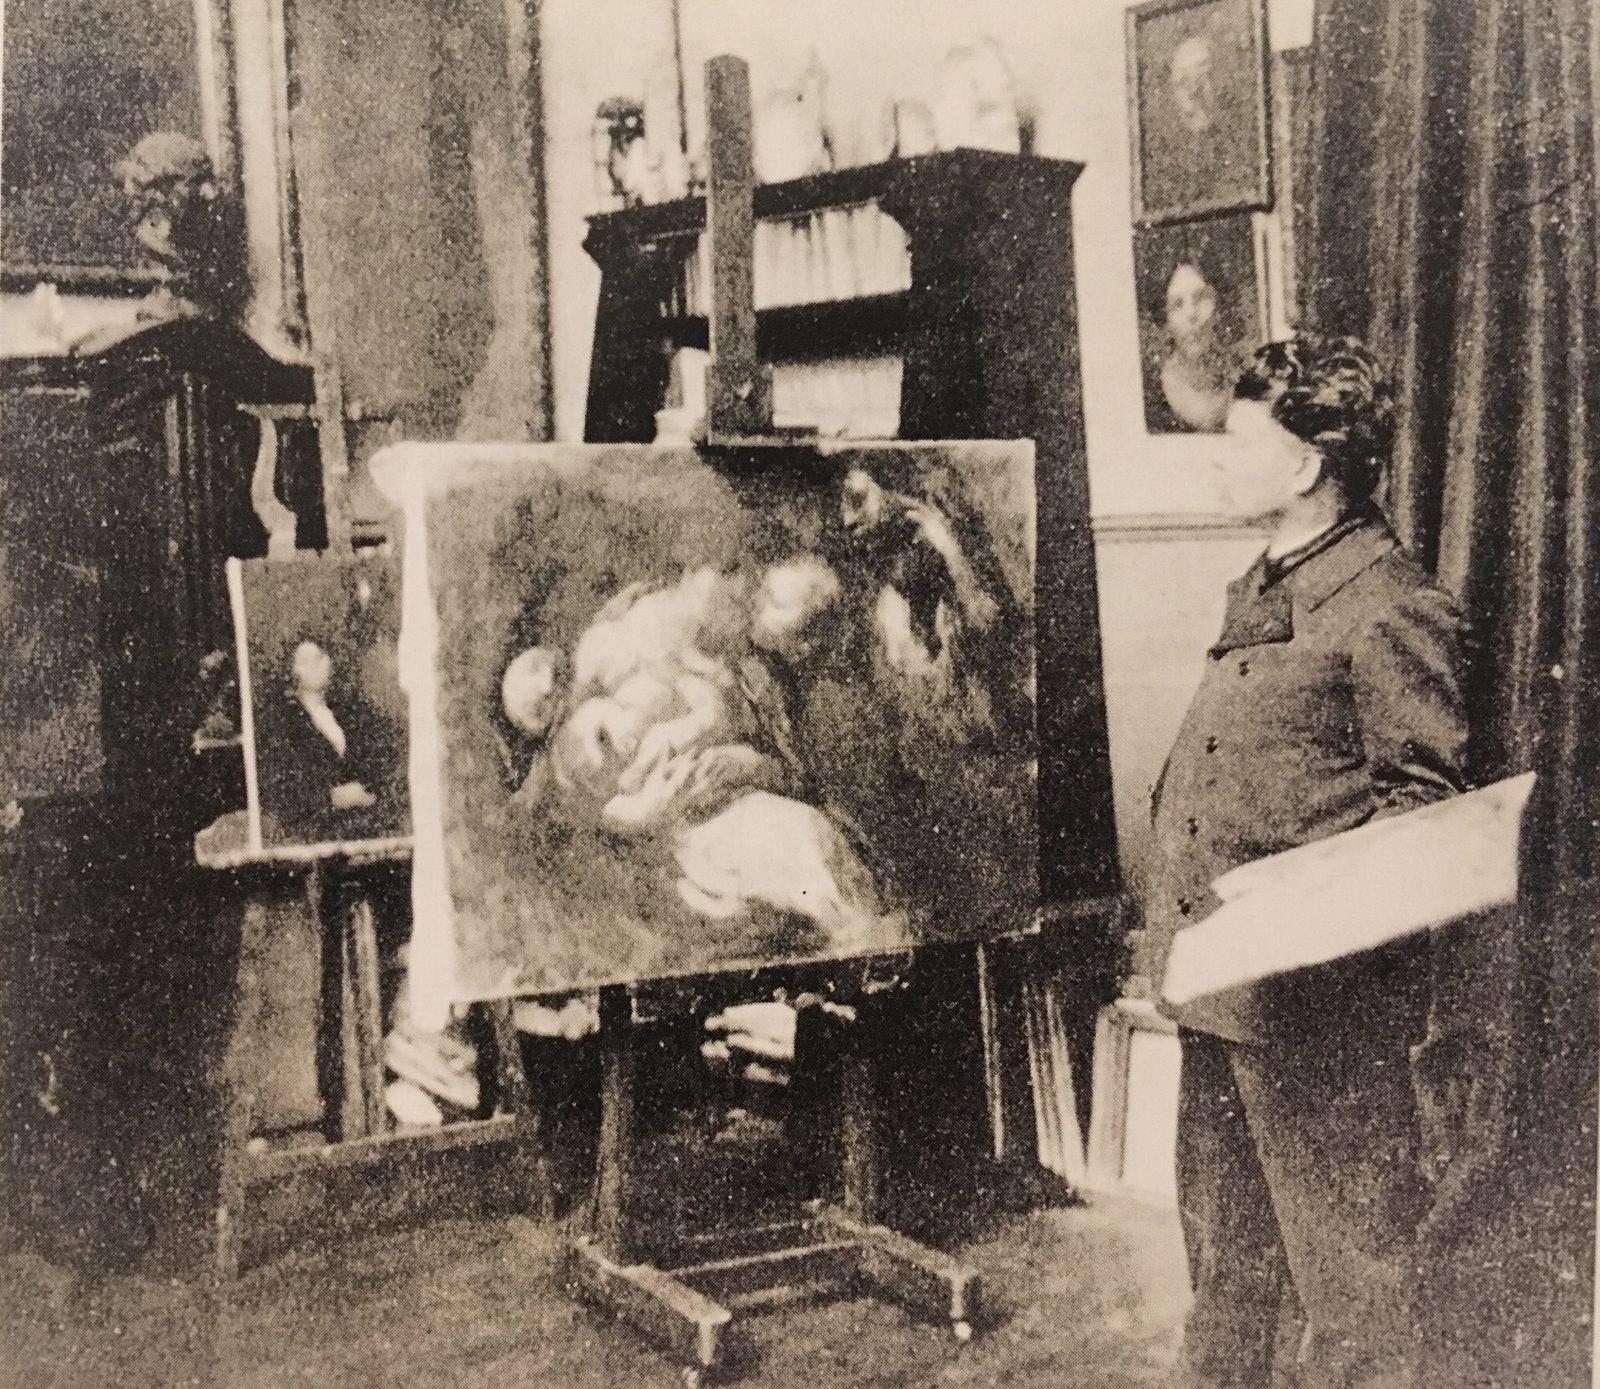 Eugene Carriere, Eugene Carriere studio, villa des arts paris, 1901 artist, 1900s, 18th century, fine artist, art lecture, london fine arts, london fine art studios, art lectures london, nneka uzoigwe